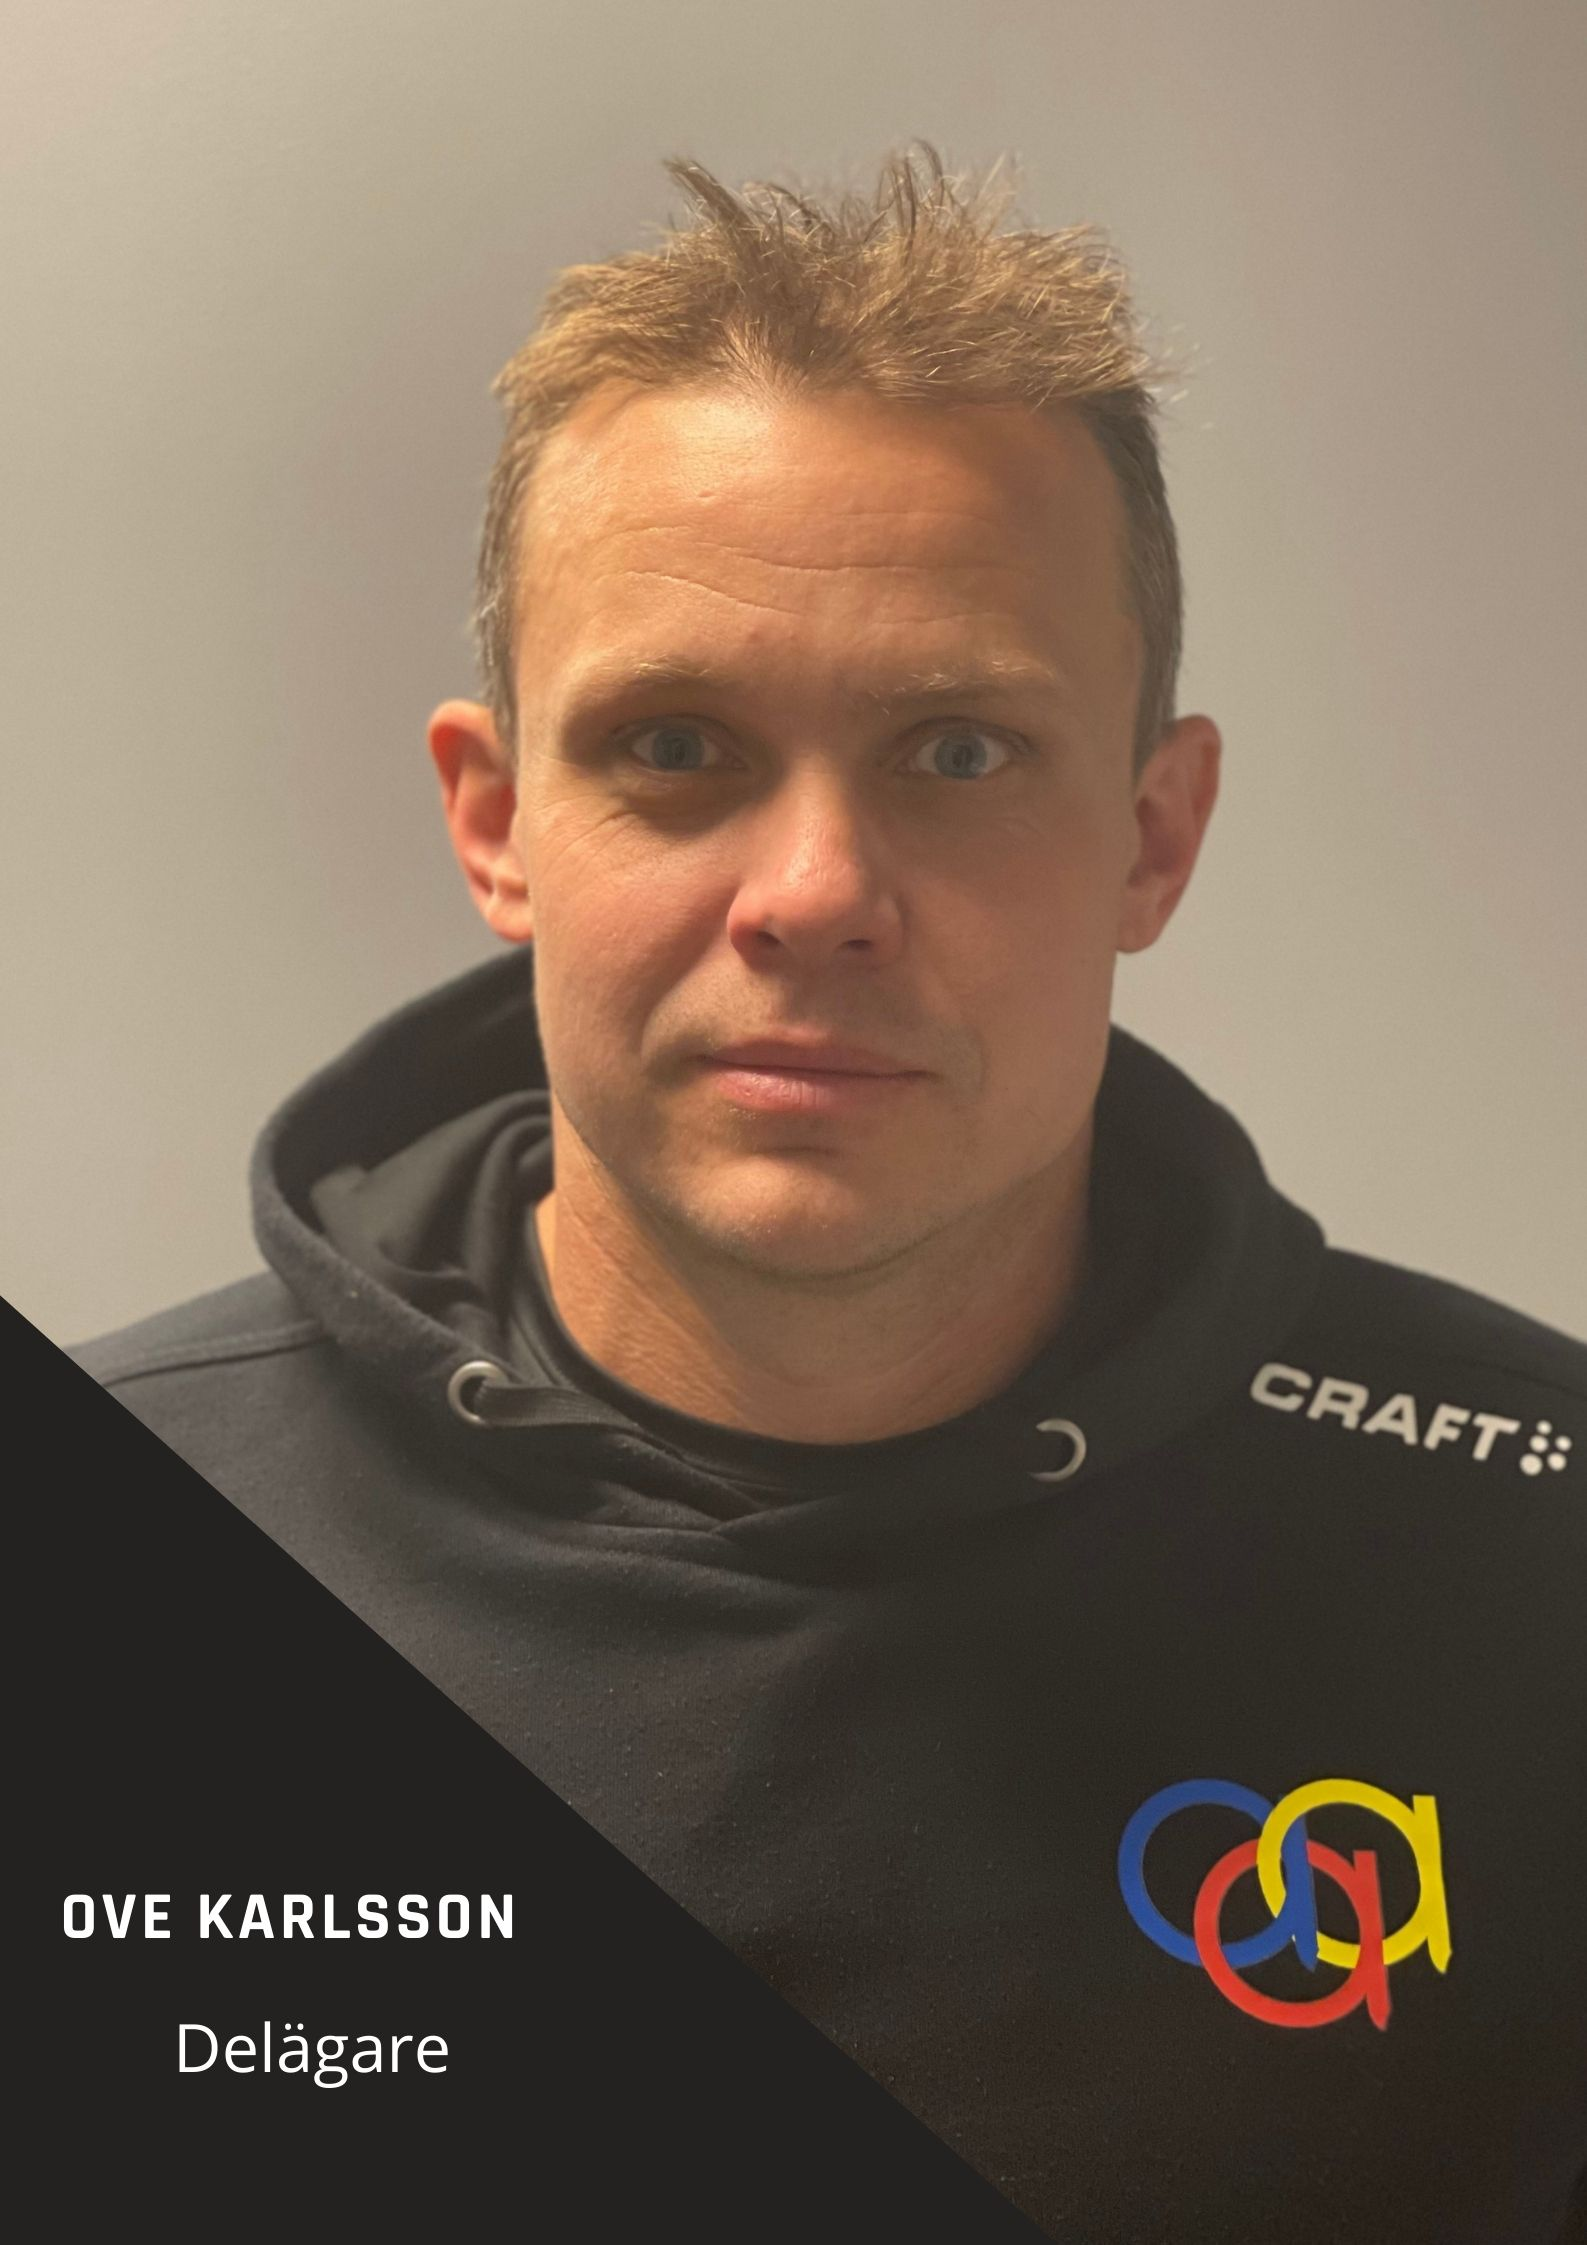 Ove Karlsson